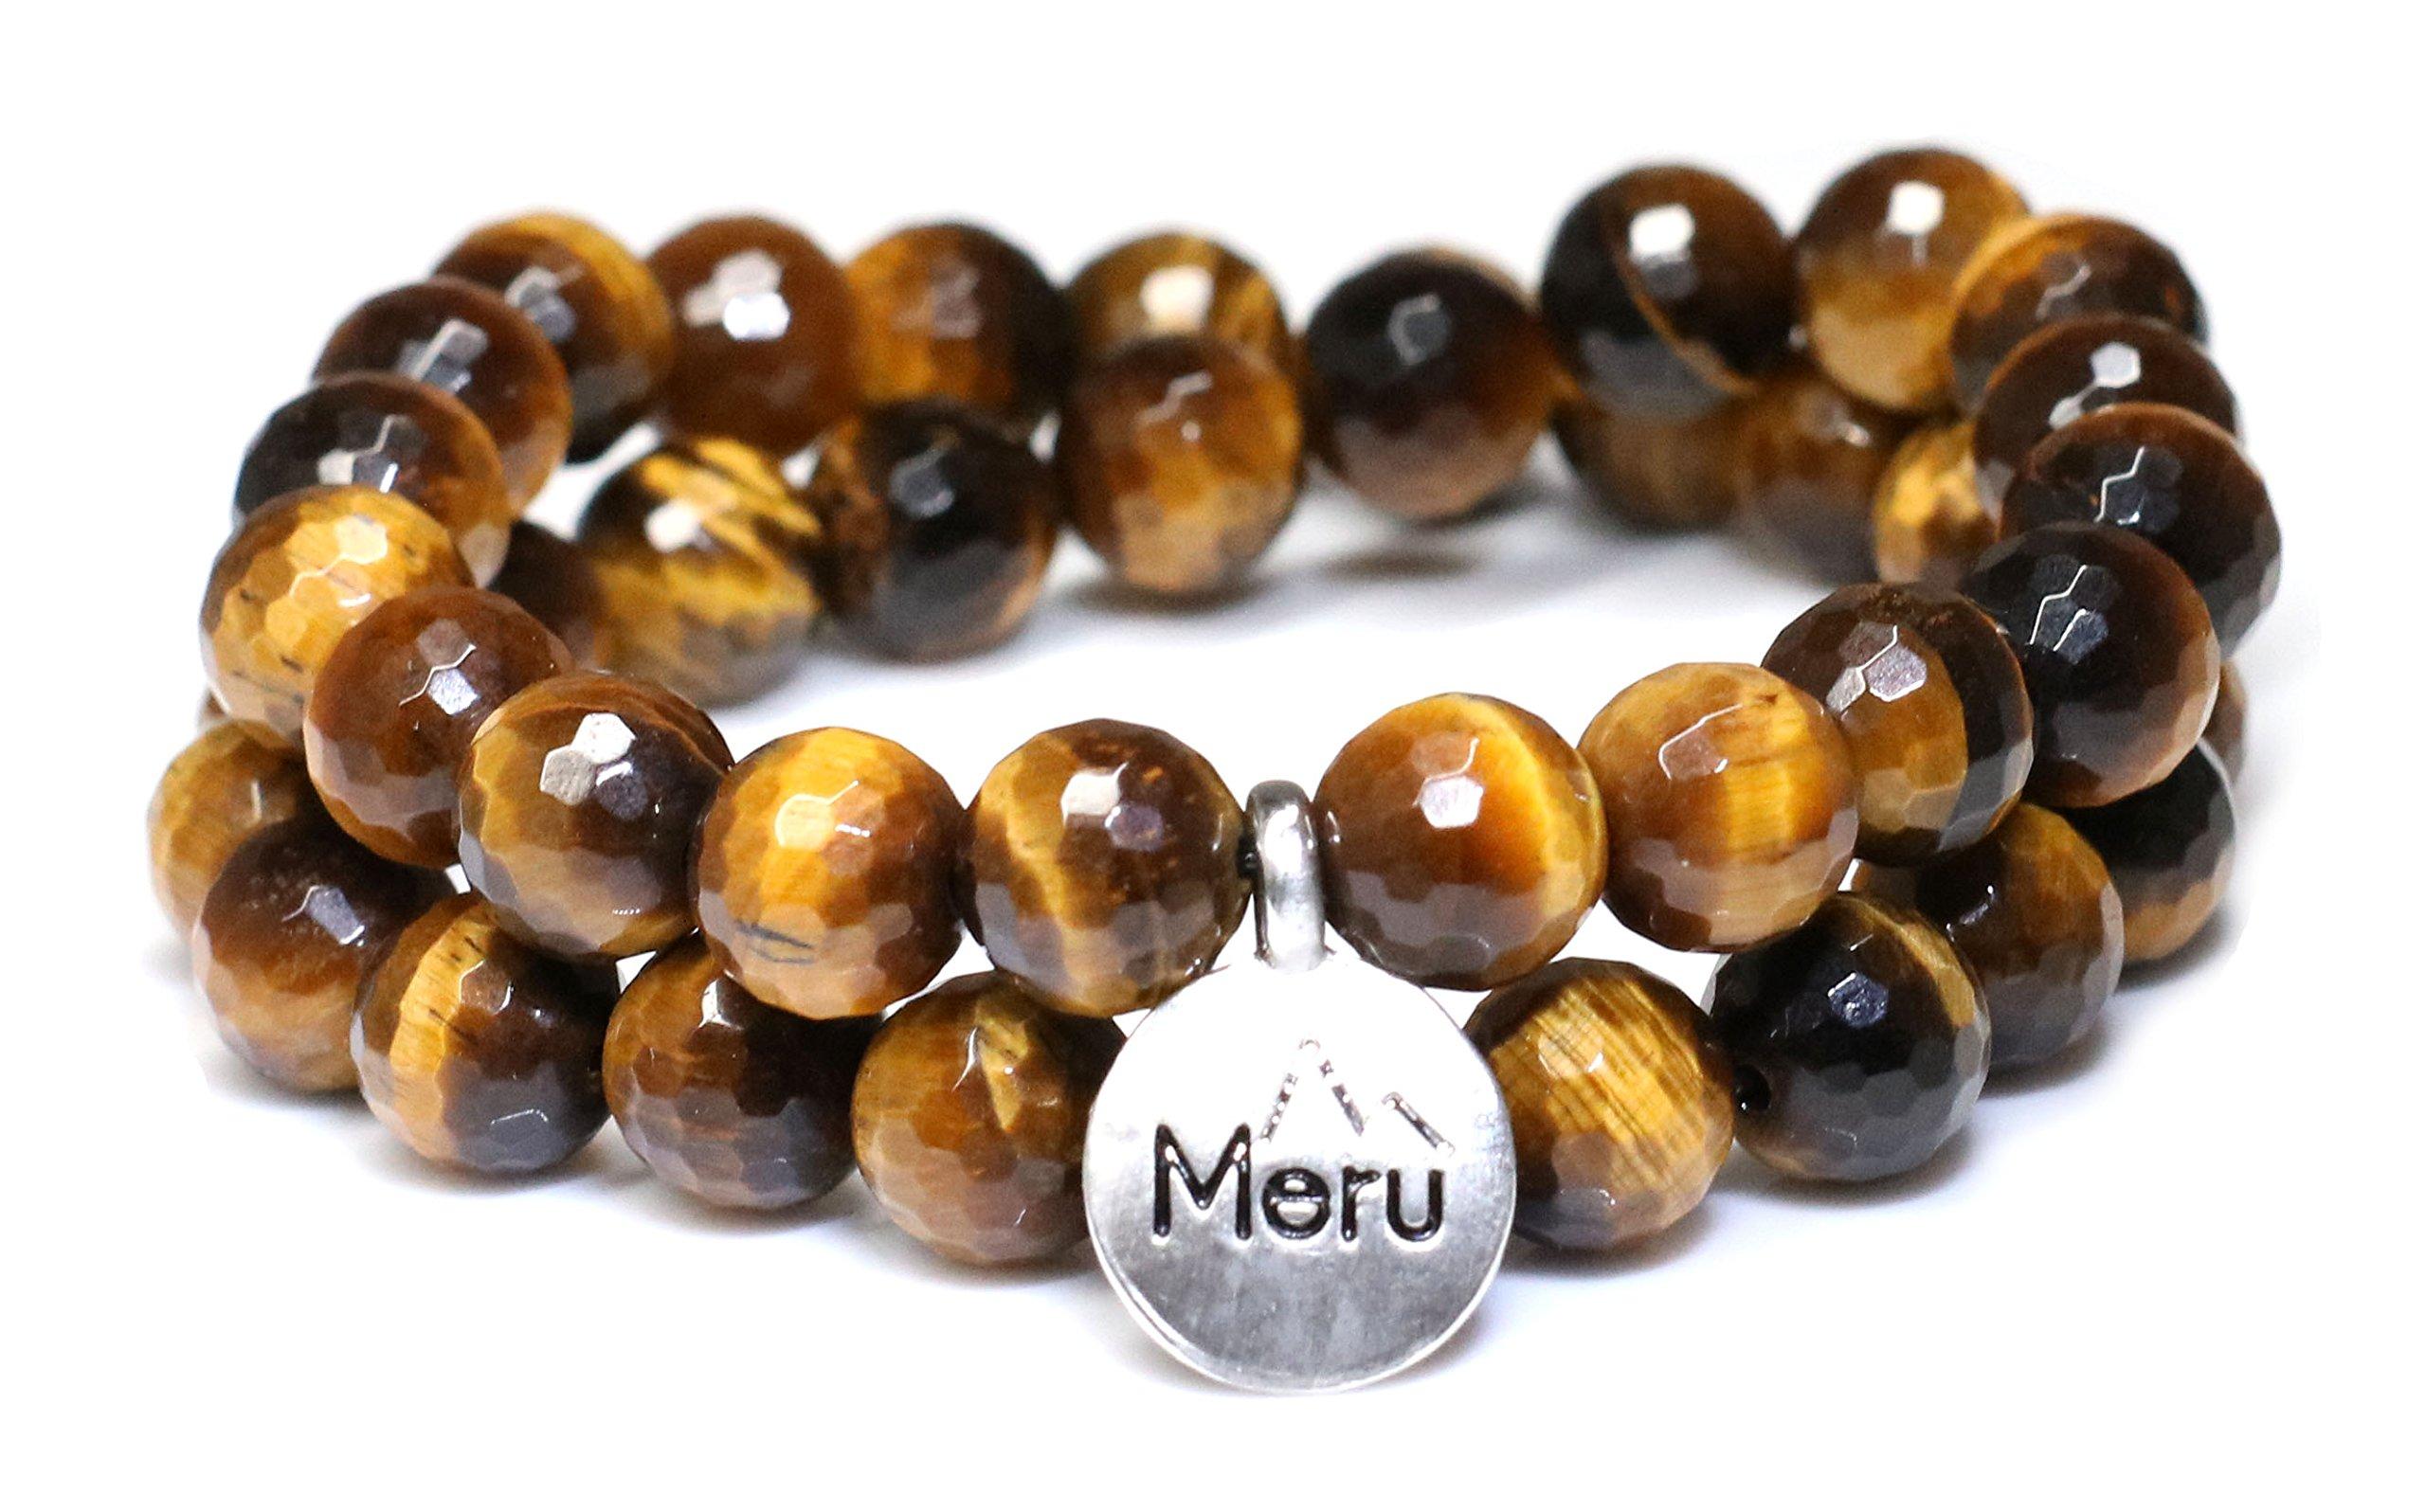 Medium Size - Faceted Tigers Eye Wrap Bracelet for Women - Tigers Eye Bracelet - Tigers Eye Faceted Bracelet for Women